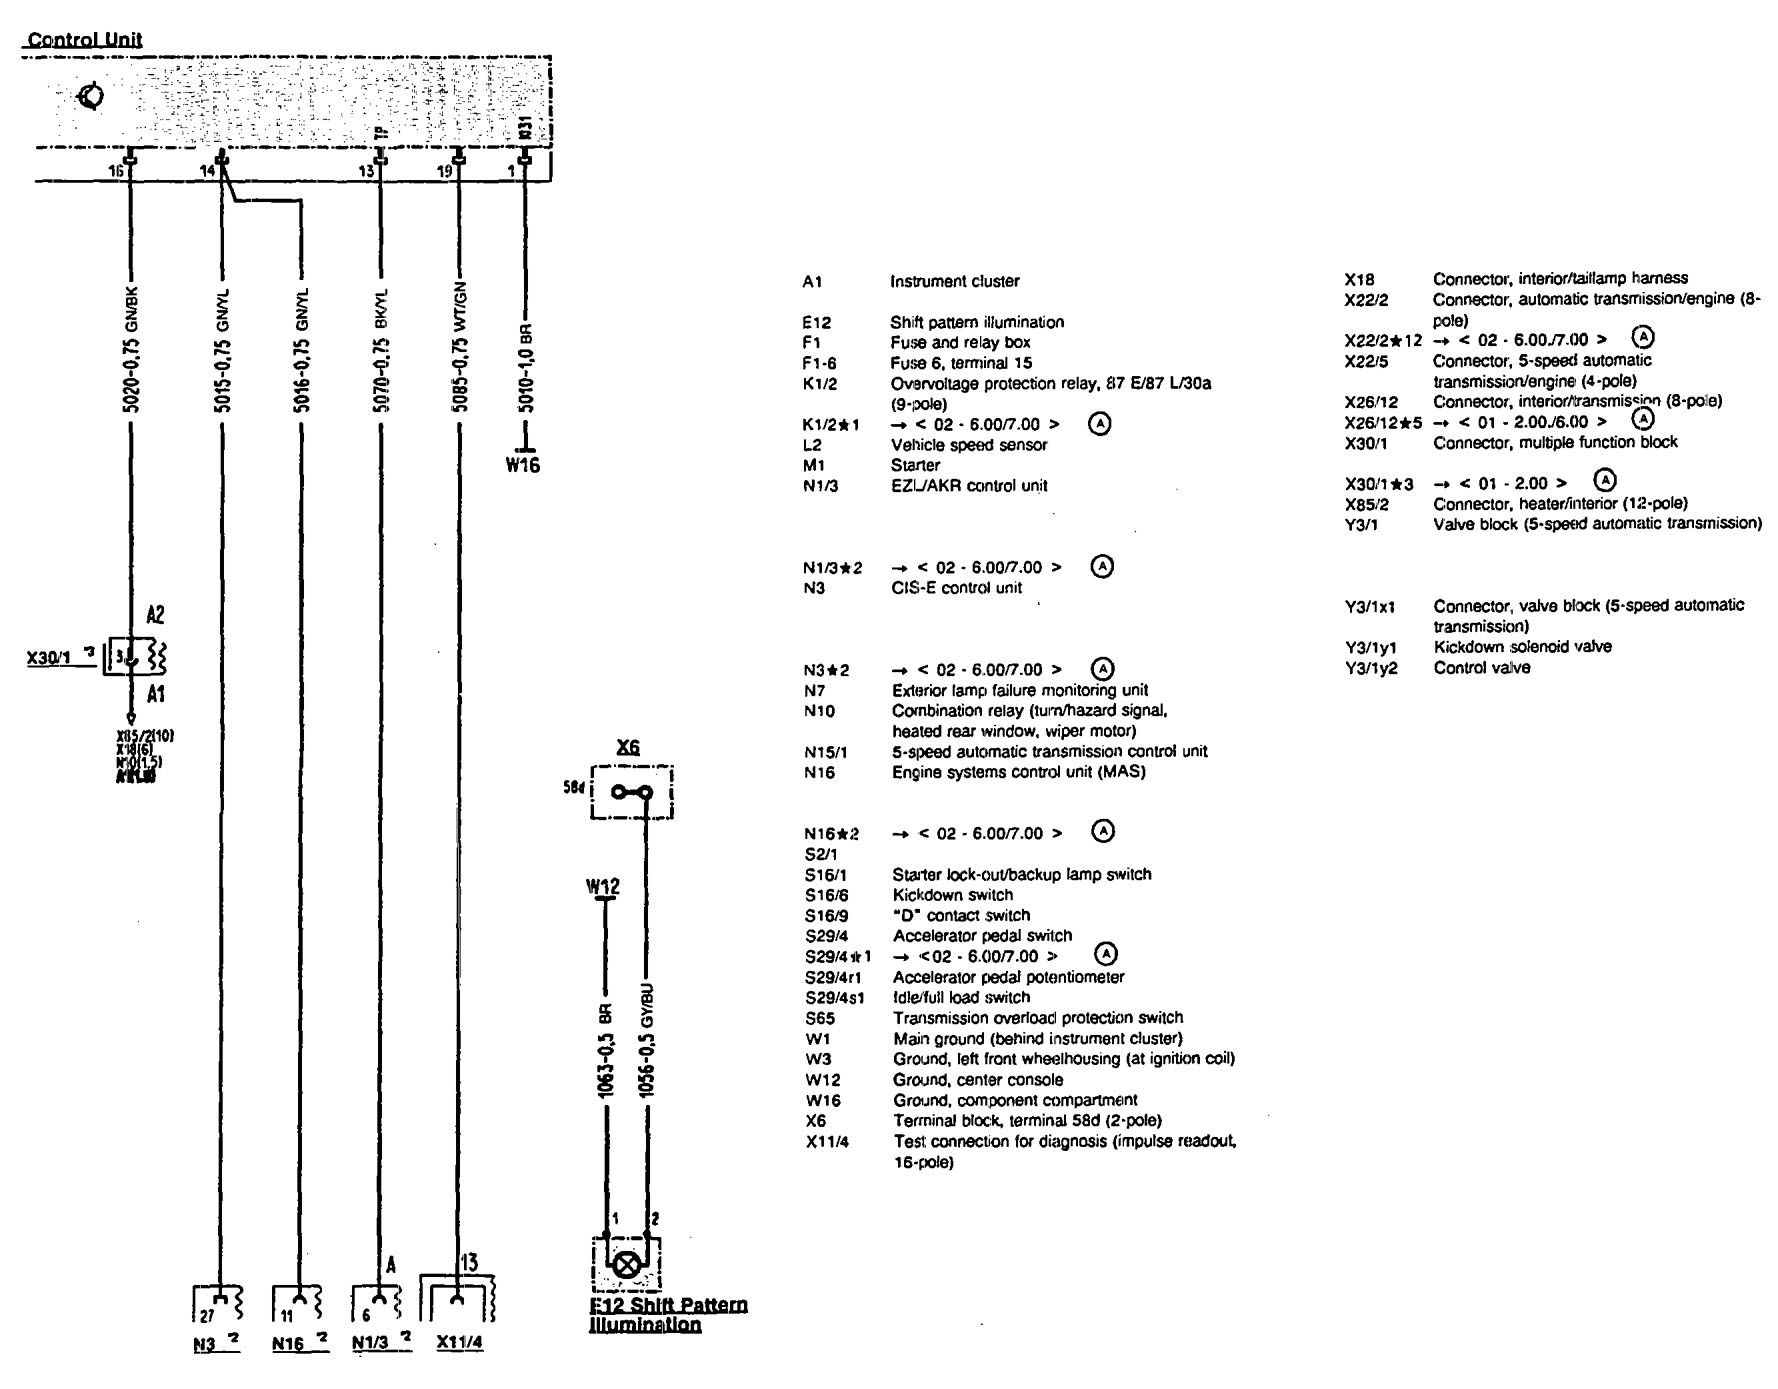 mercedes sl500 wiring diagram workhorse motorhome benz 500sl 1990 1993 diagrams transmission controls part 2